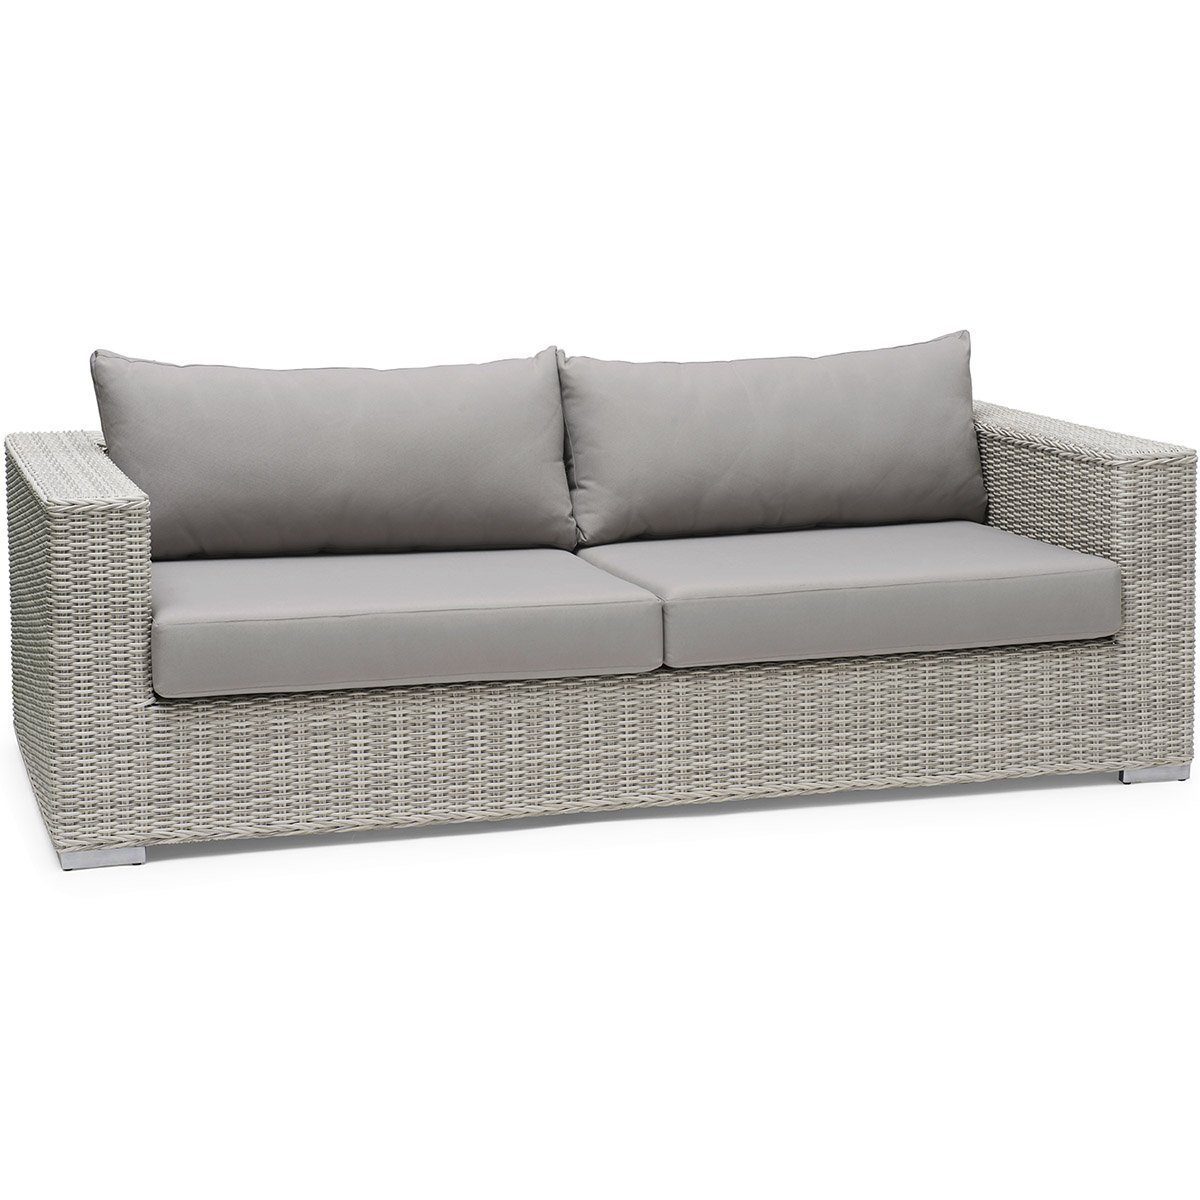 Hamilton lounge soffa i konstrotting.